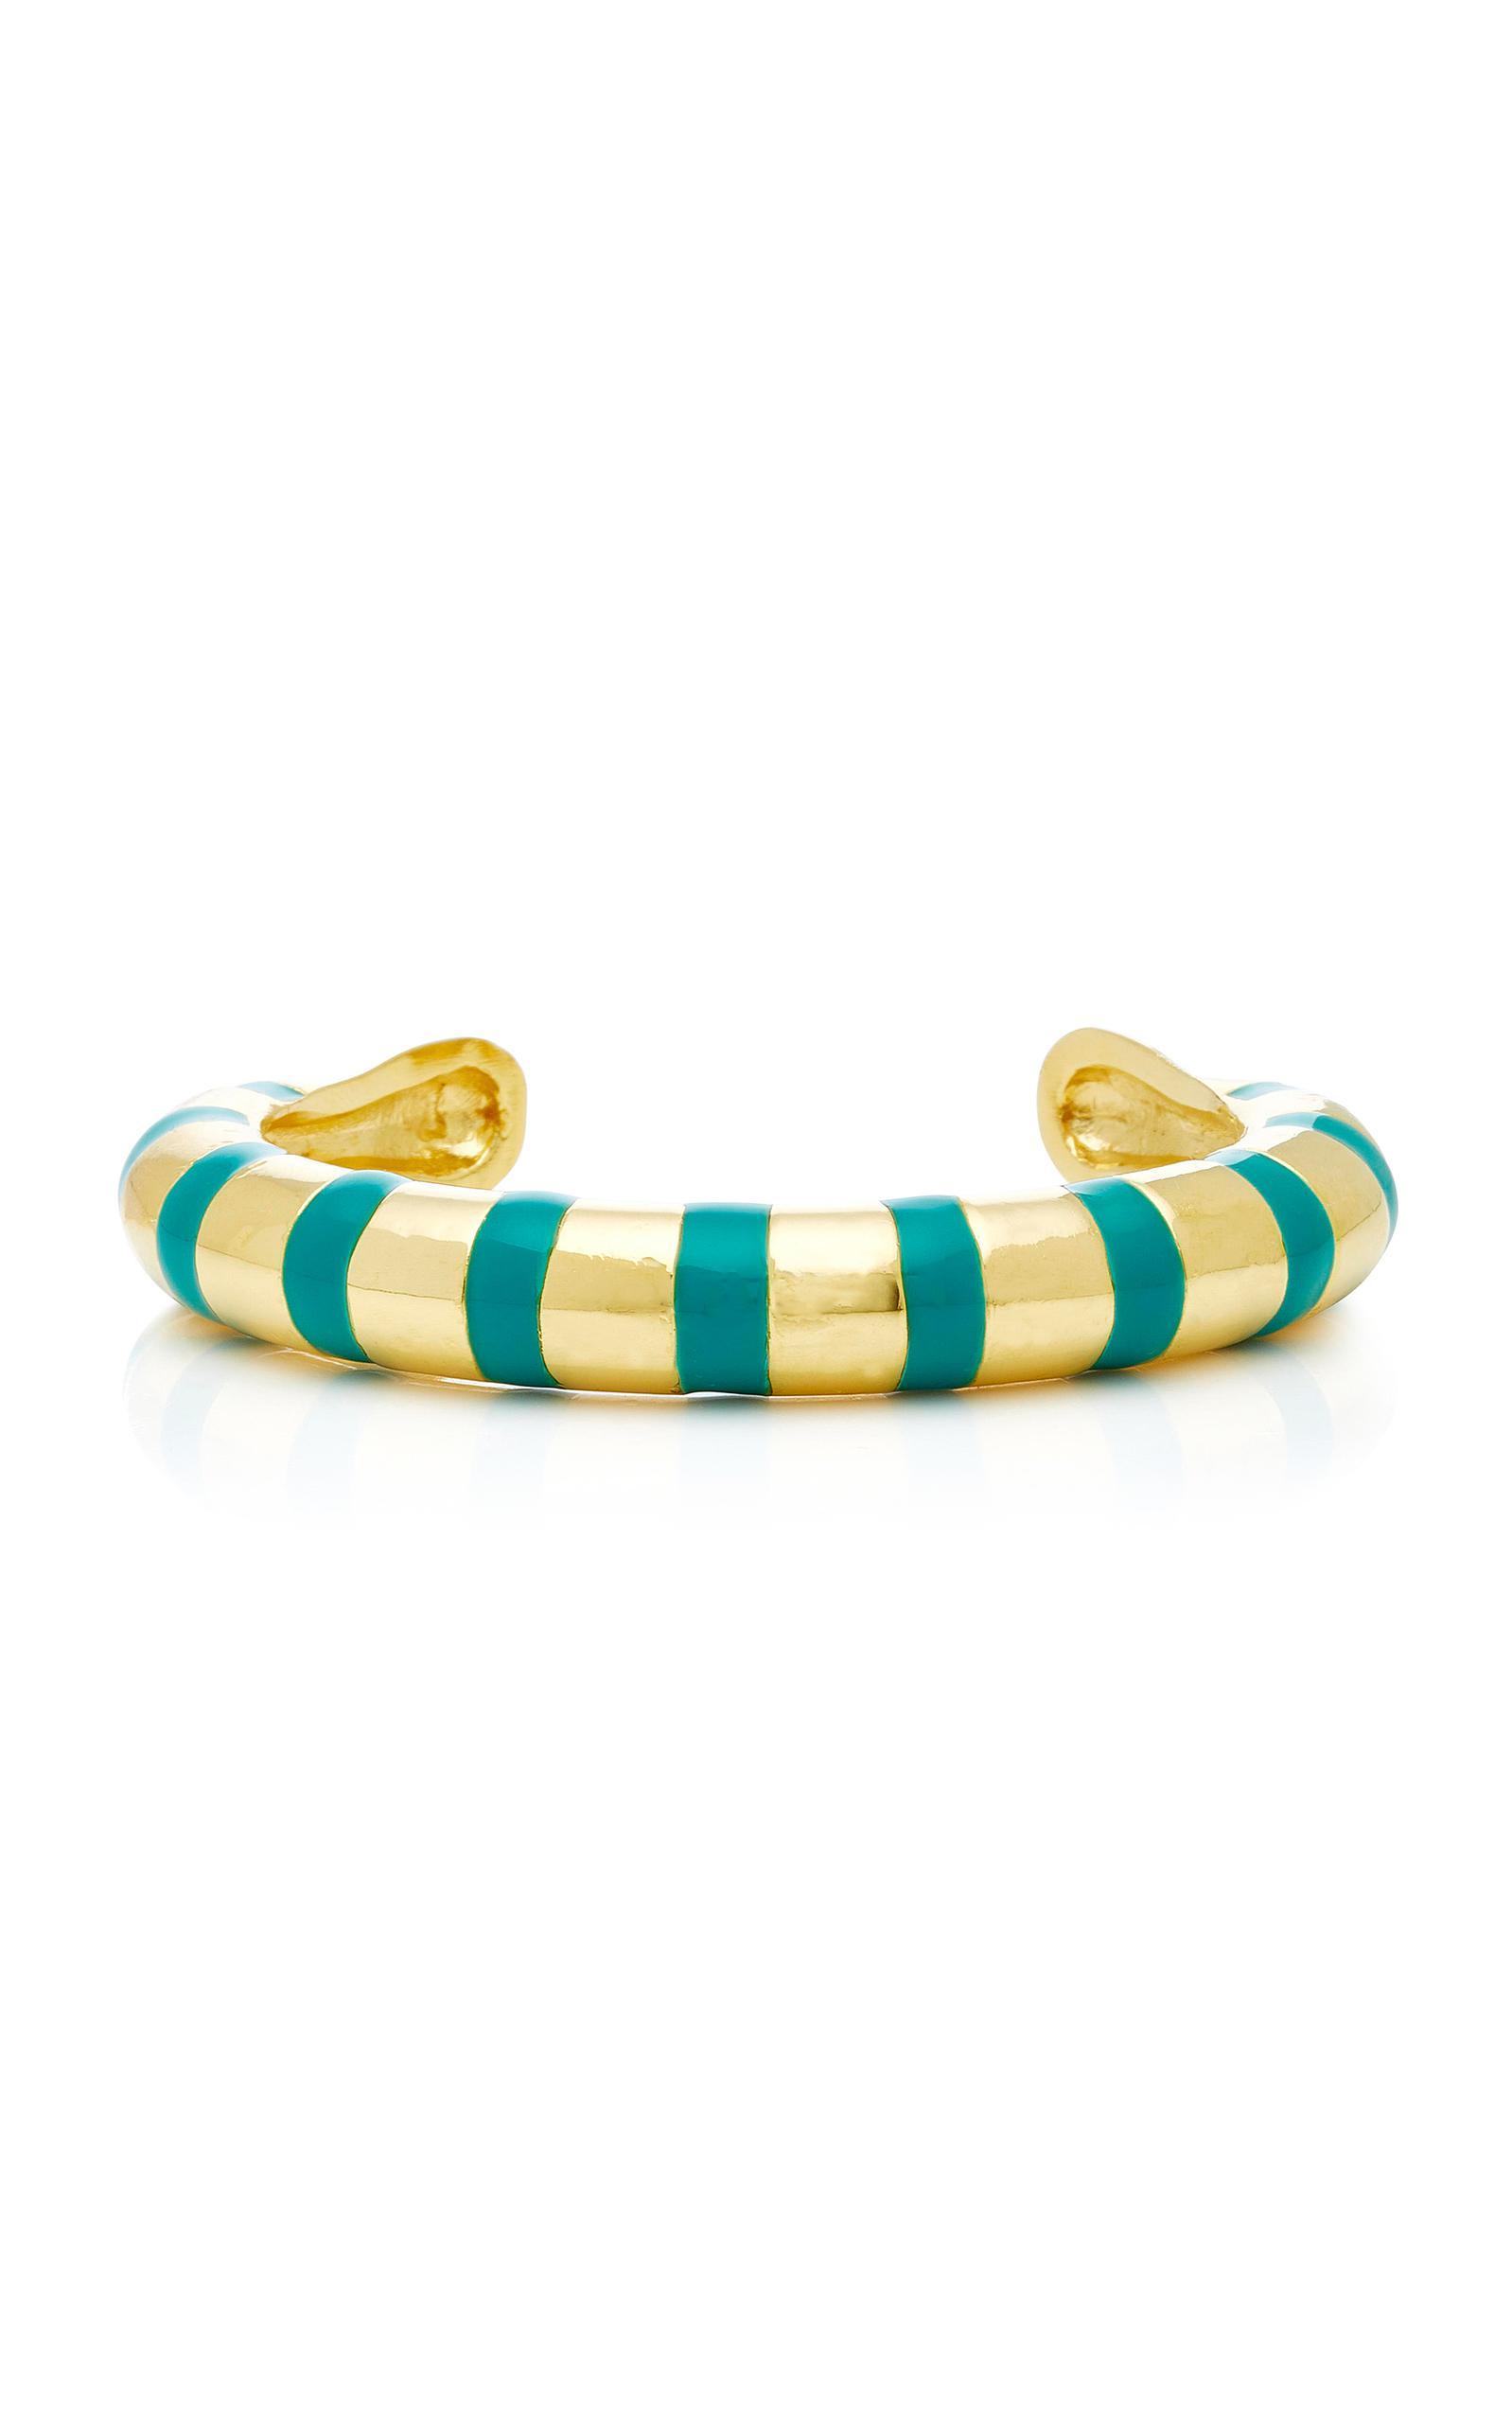 Aurélie Bidermann Maria Bracelet With Green Enamel in Green Enamel and 18K Gold-Plated Brass LABNQgo3t9